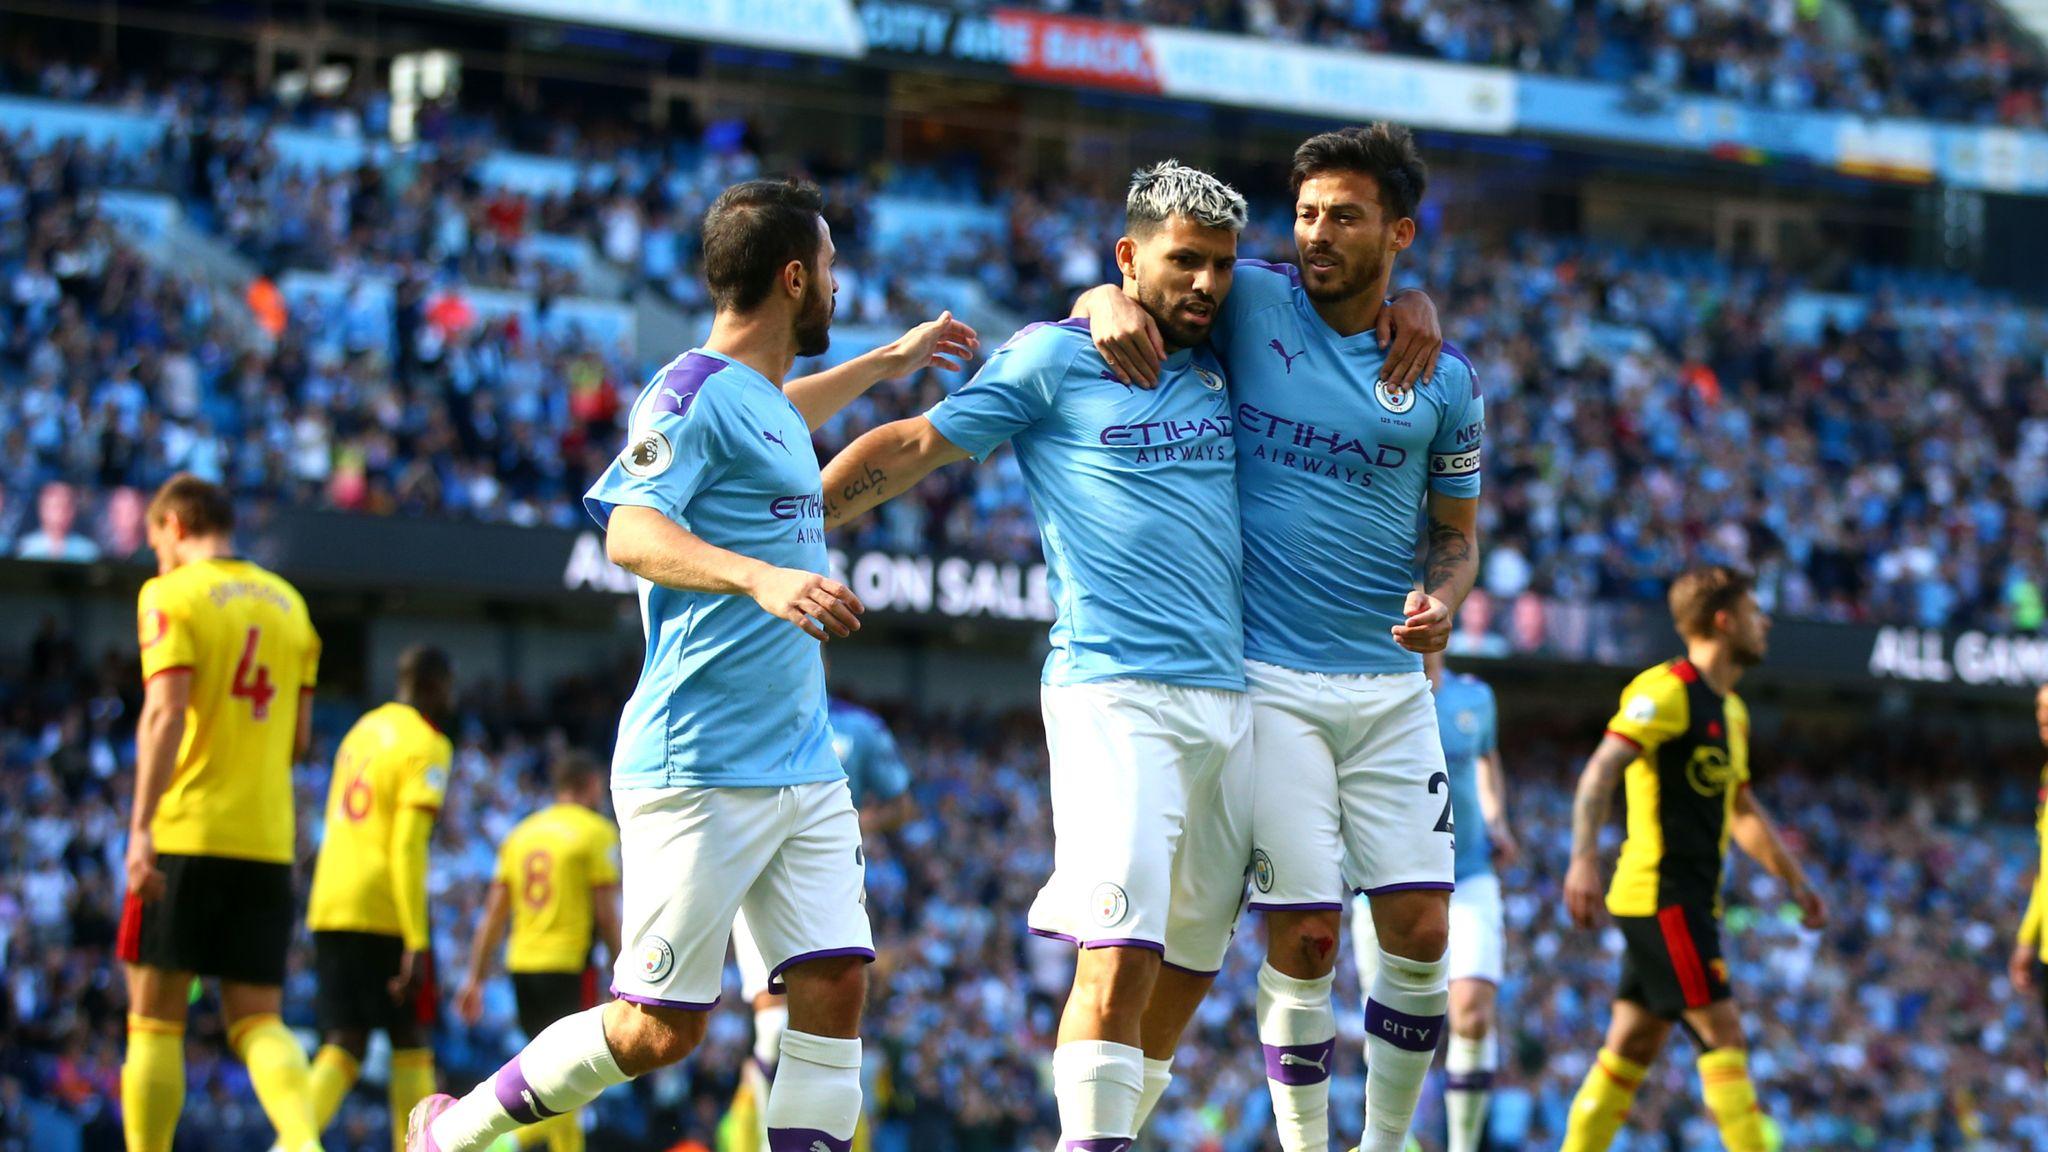 Man City 8 - 0 Watford - Match Report & Highlights